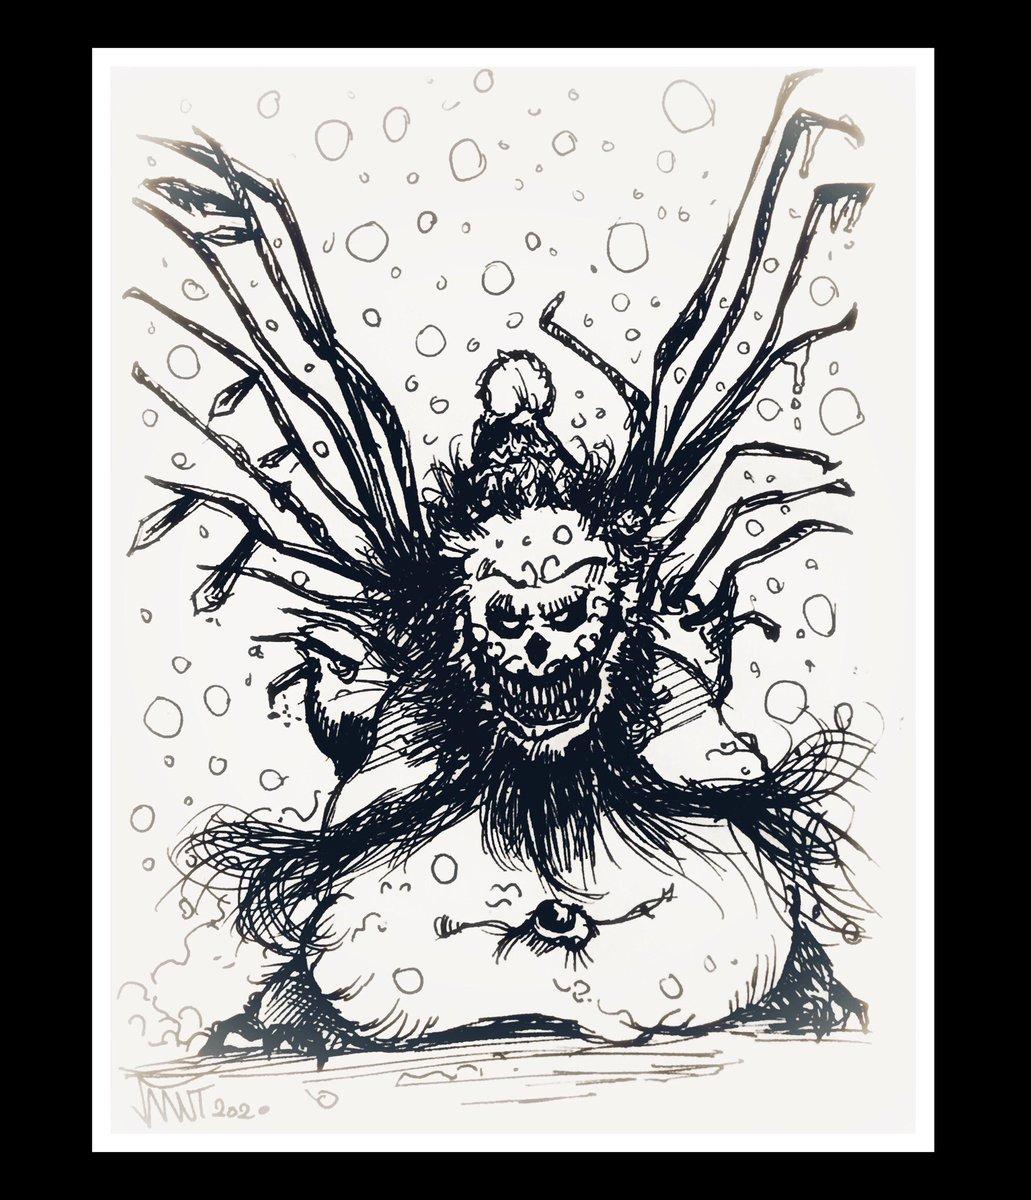 Snowman of Long Cold Winter Nights Sketch  #snowman #long #cold #winter #night #snow #sketch #creature #design #horror #korku #character #characterdesign #creaturedesign #art #artist #illustration #illustrator #drawing #sketchbook #sketching #ink #inking